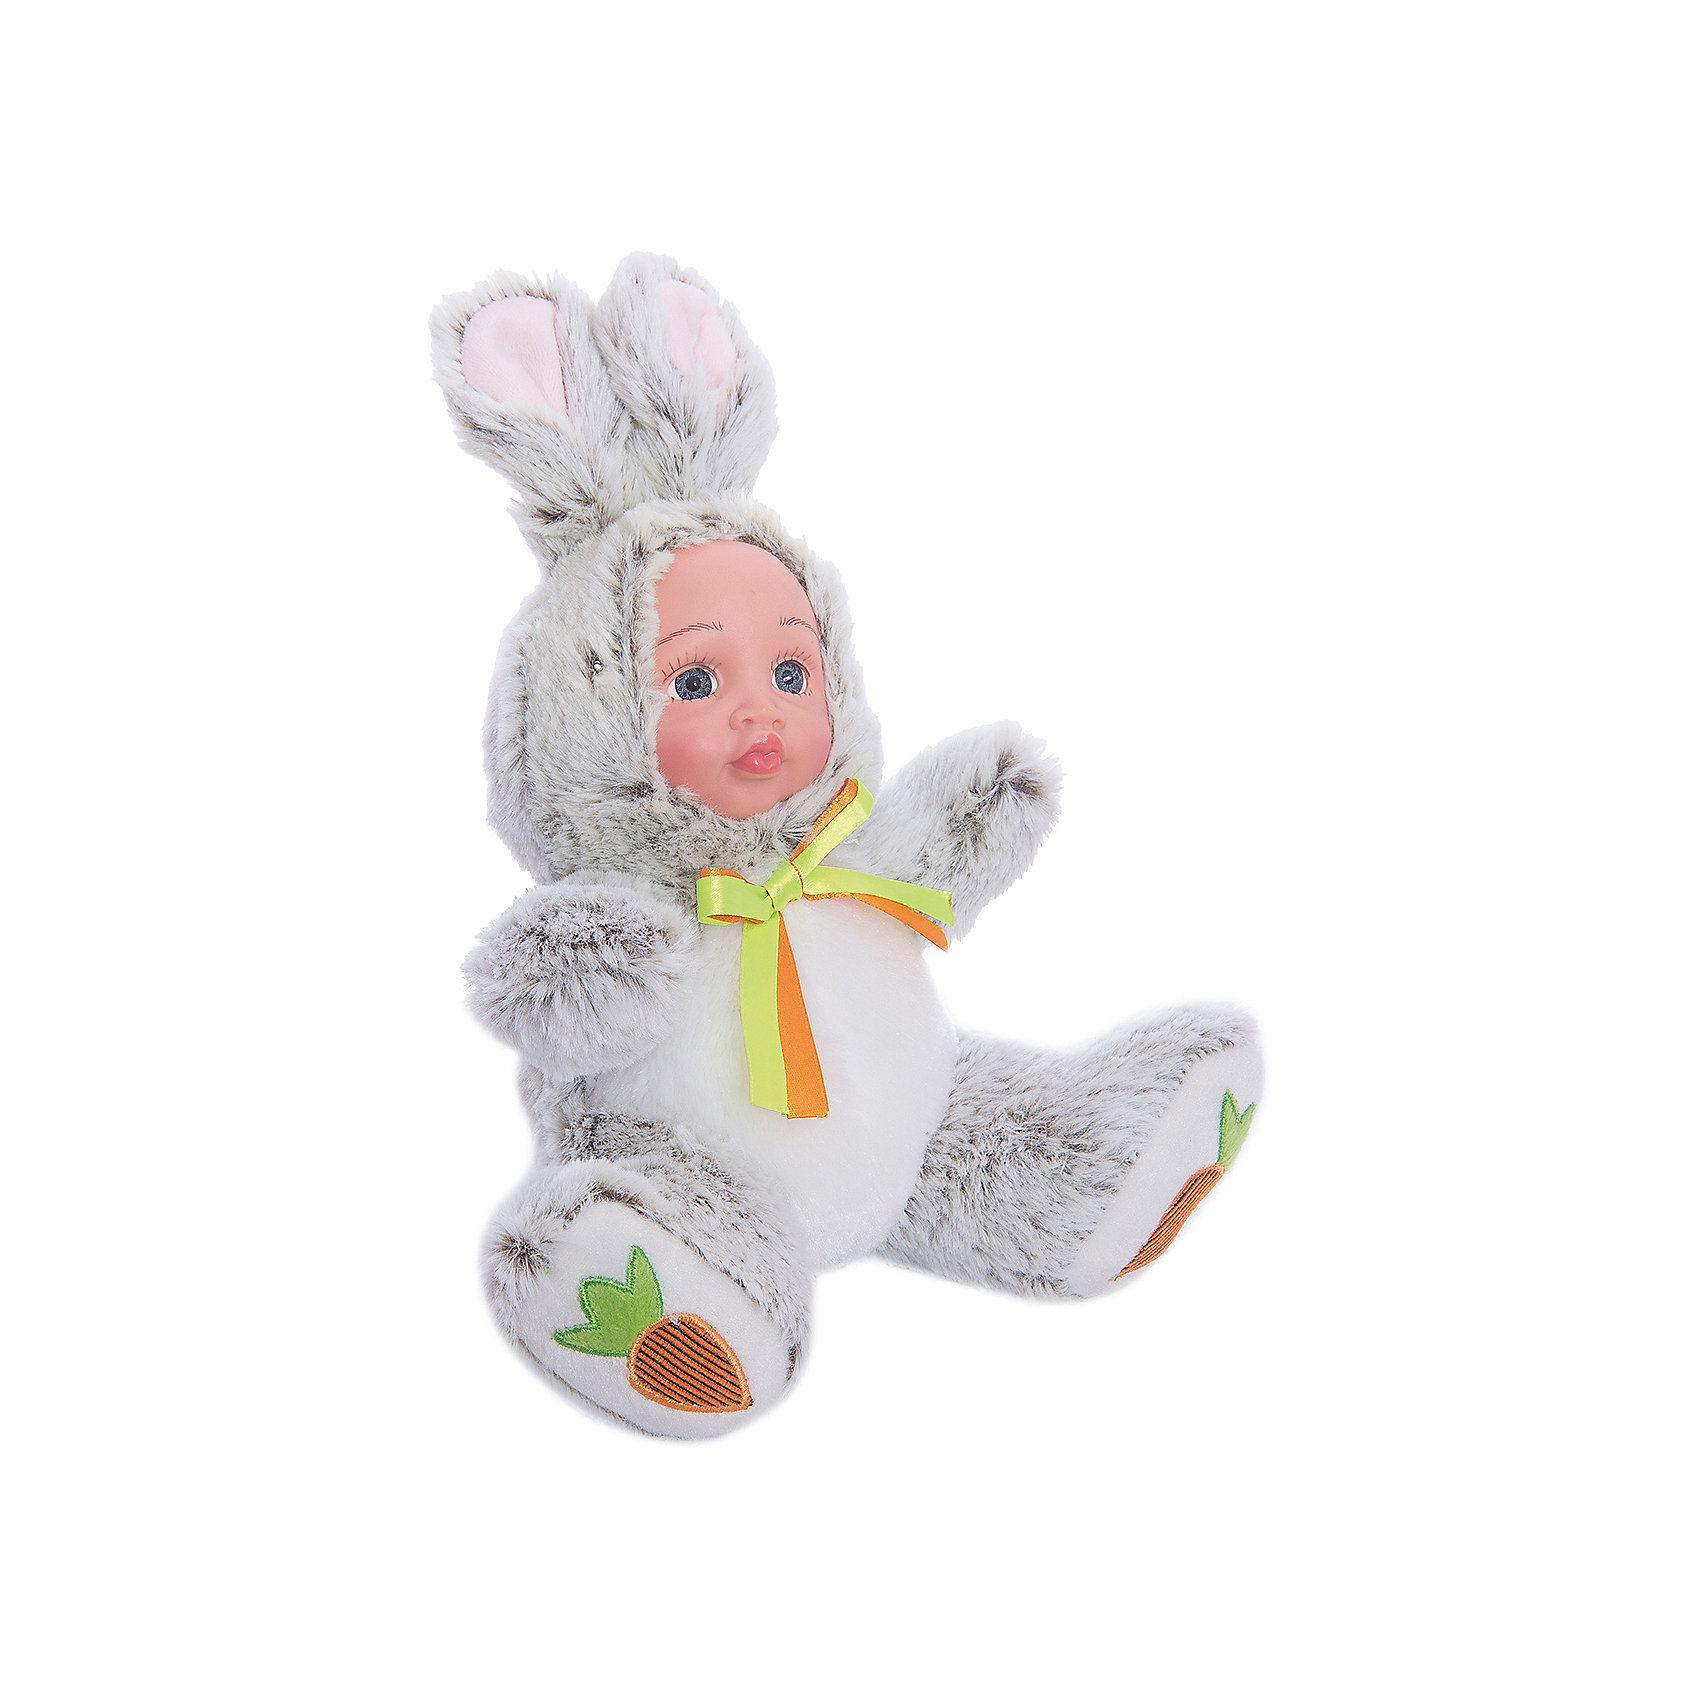 Fluffy Family Игрушка Мой зайчонок, Fluffy Family игрушка мгка fluffy family диджей 681031